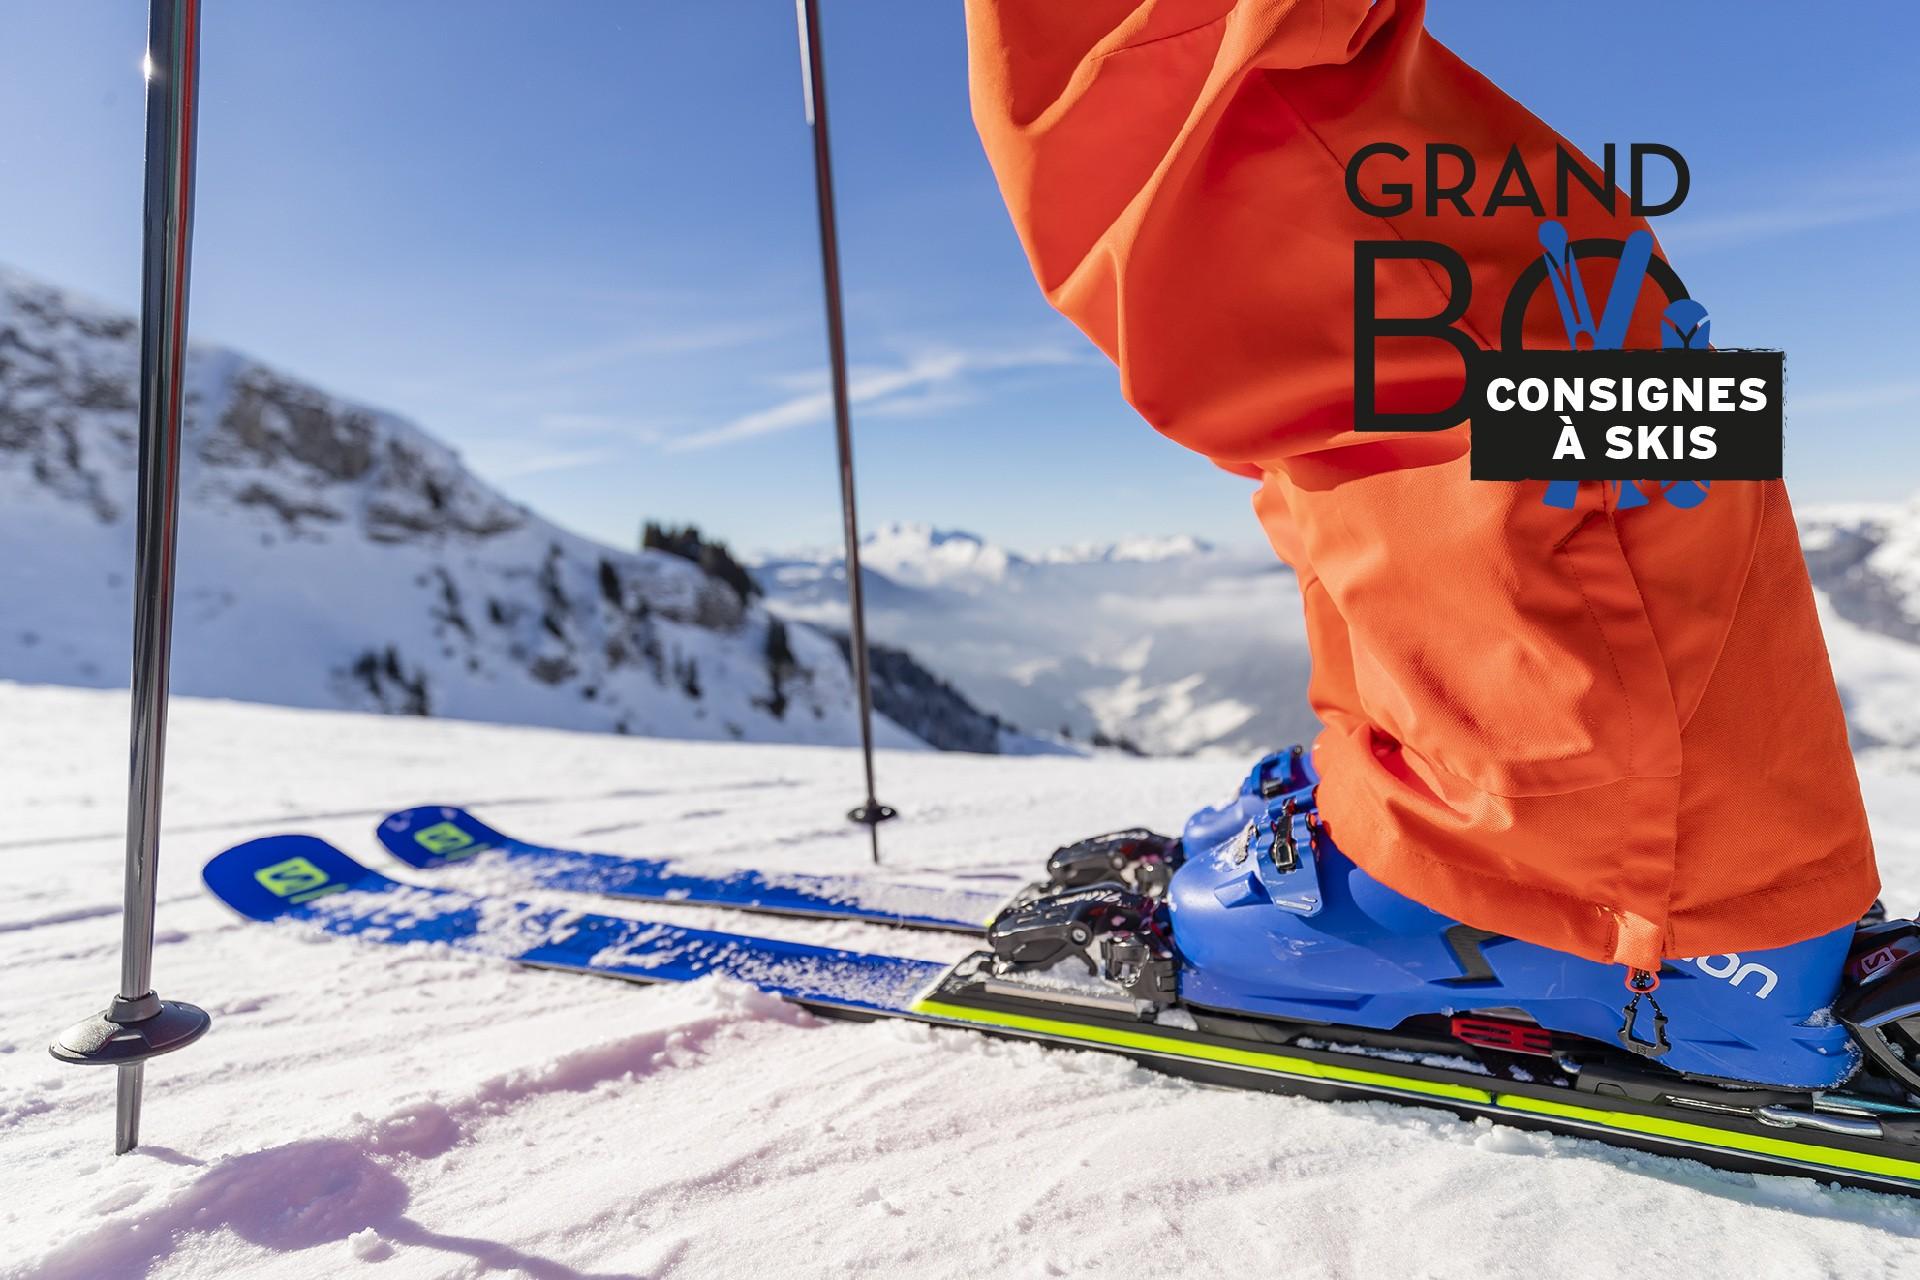 forfait ski,ski,le grand bornand,consignes